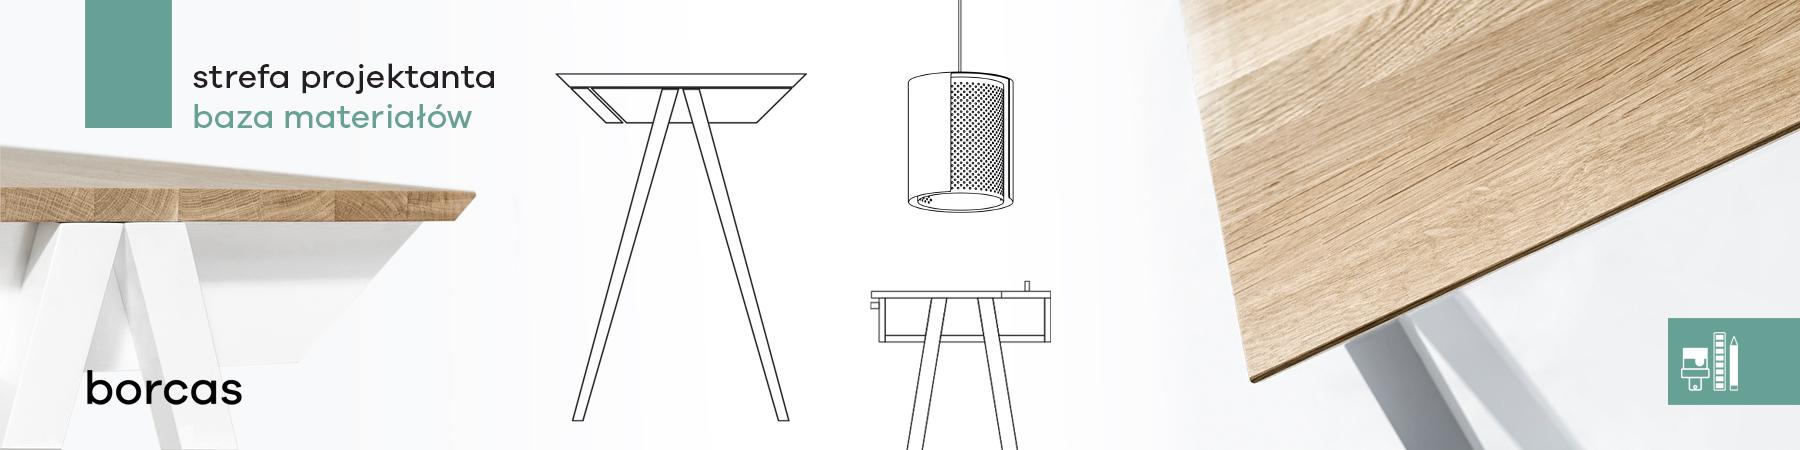 strefa projektanta udostępnione materiały do pobrania